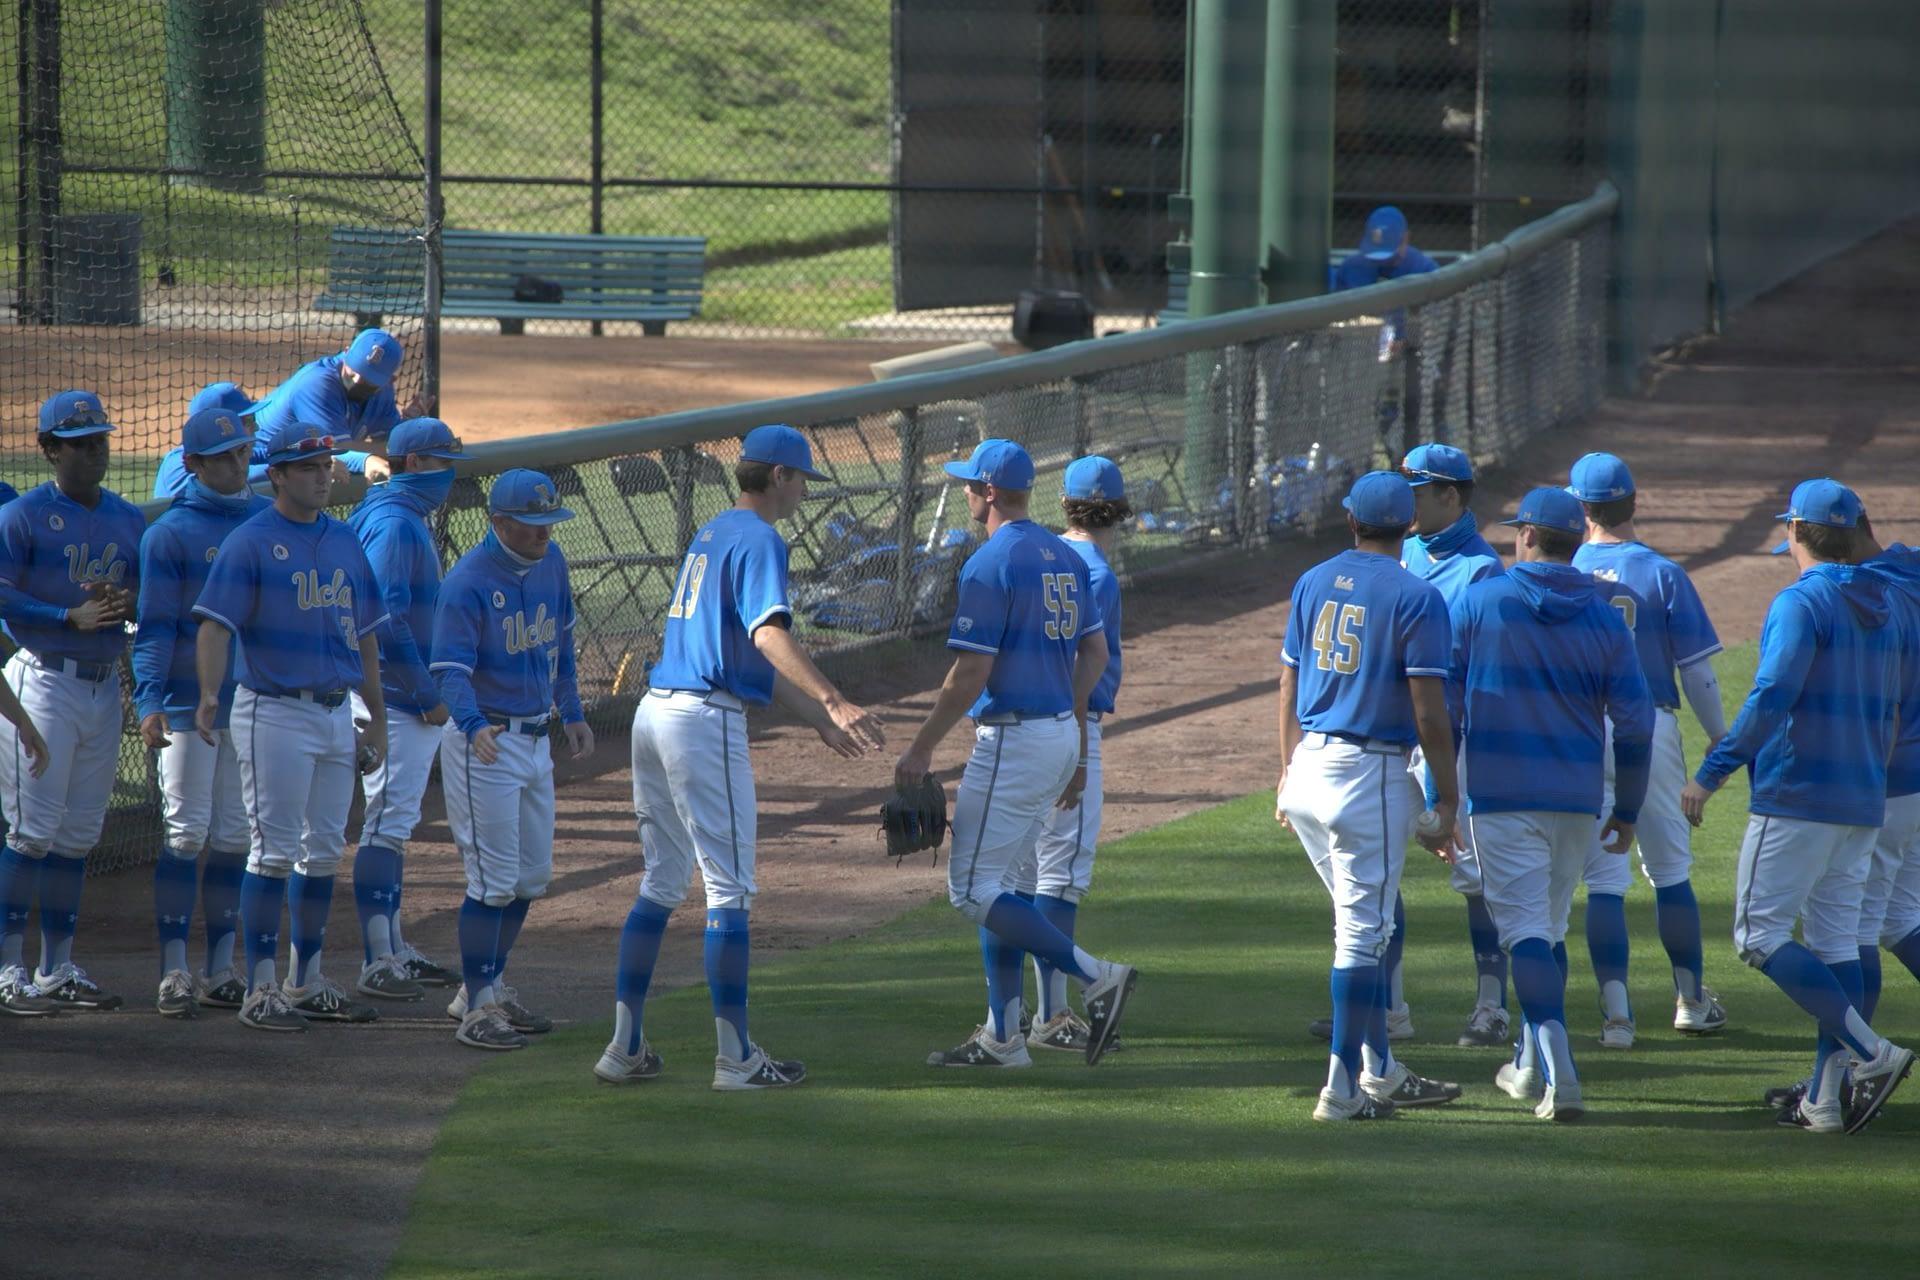 UCLAbaseball